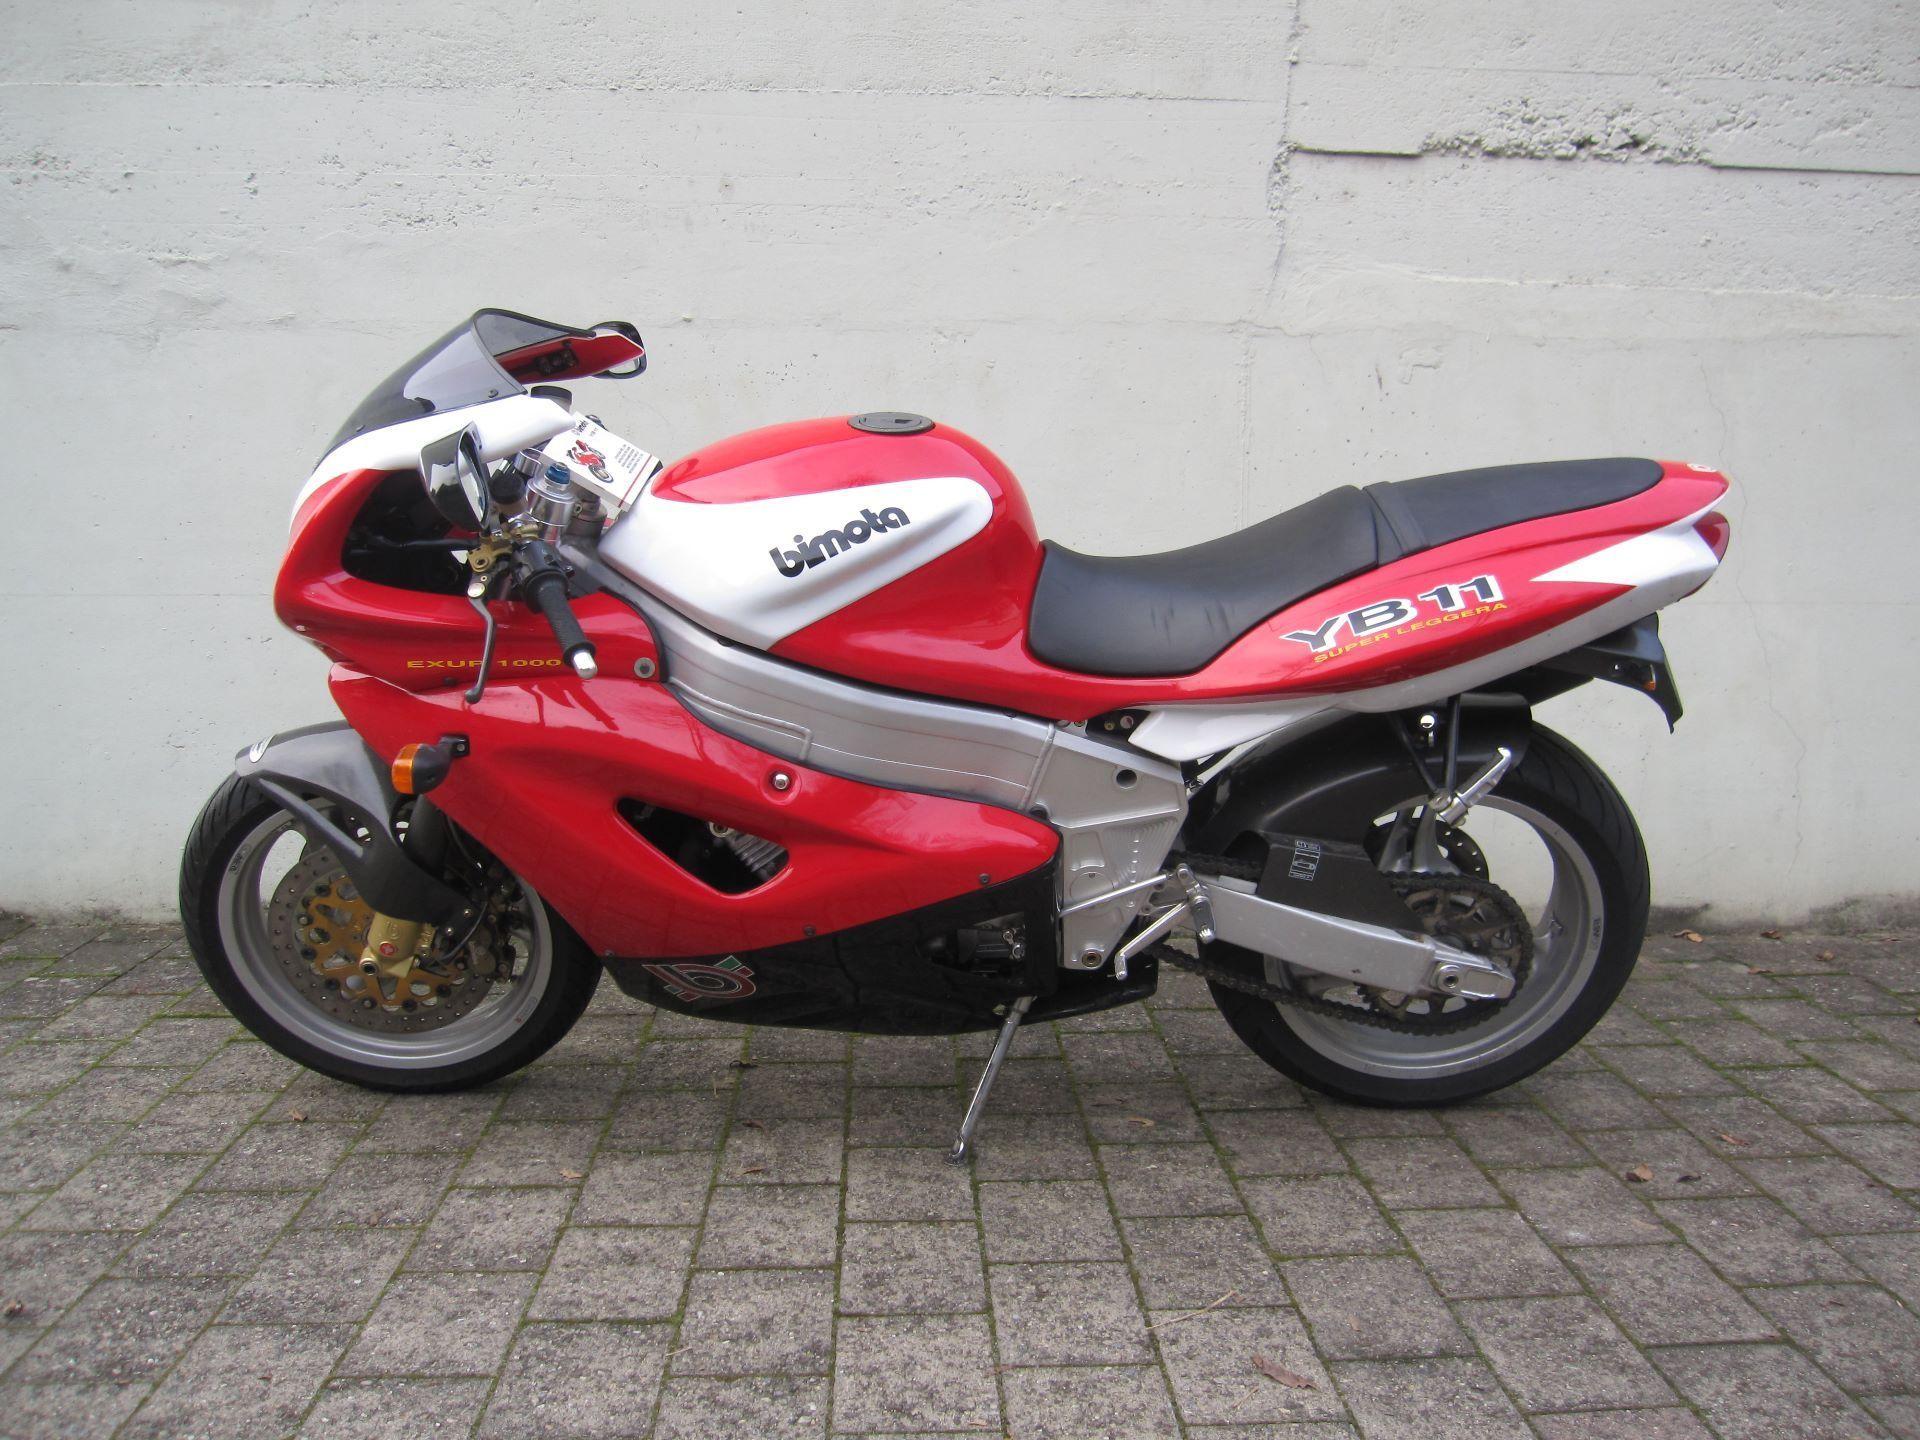 Motorrad Occasion kaufen BIMOTA YB-11 Superleggera Töff